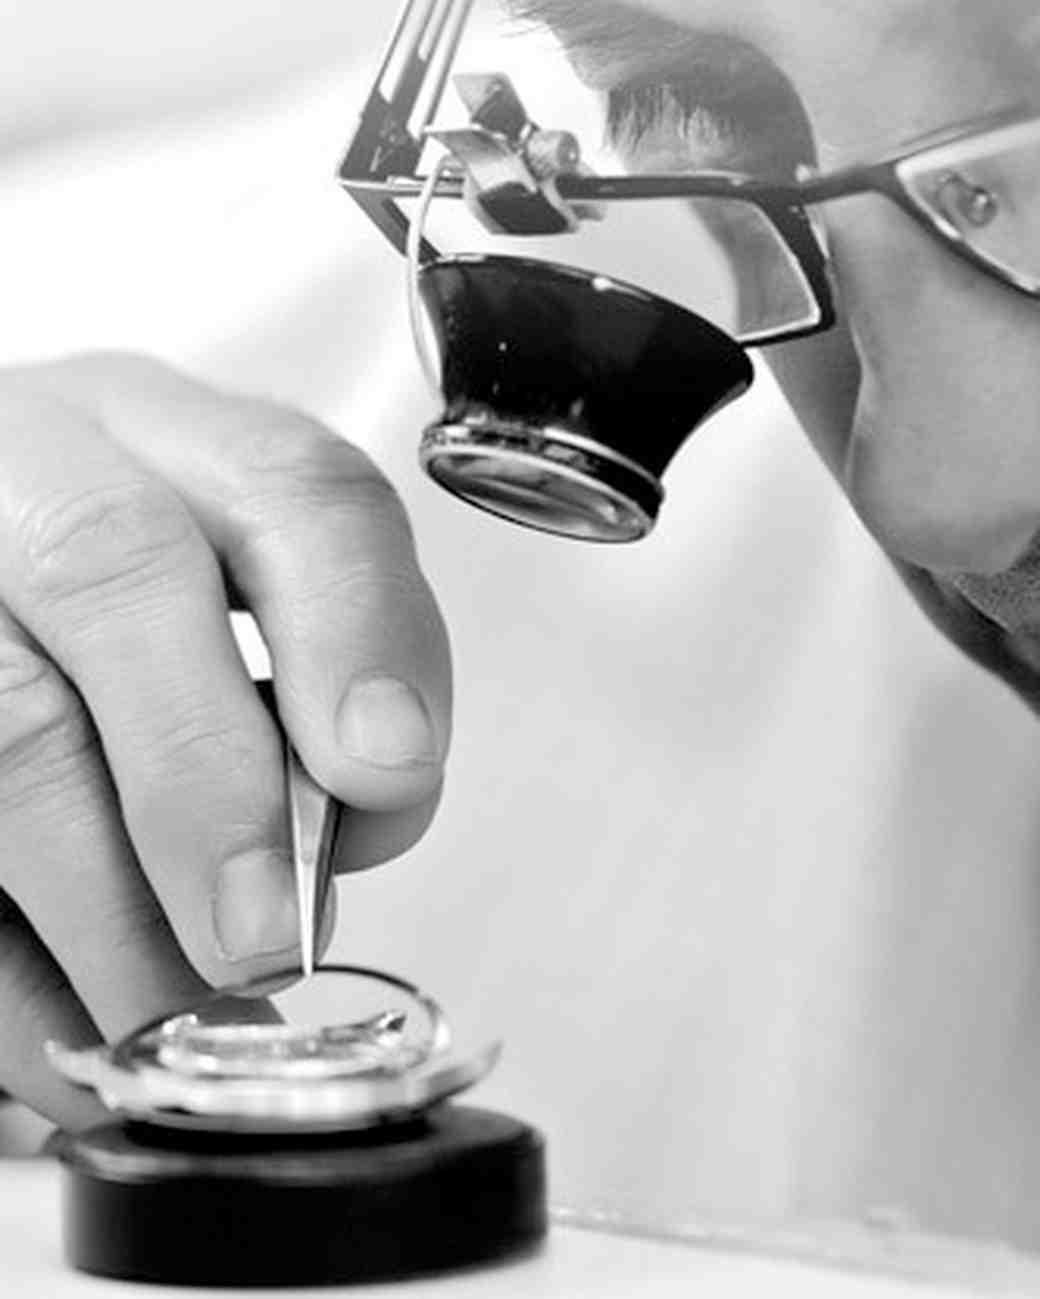 baume-mercier-watch-watch-care-1-0514.jpg